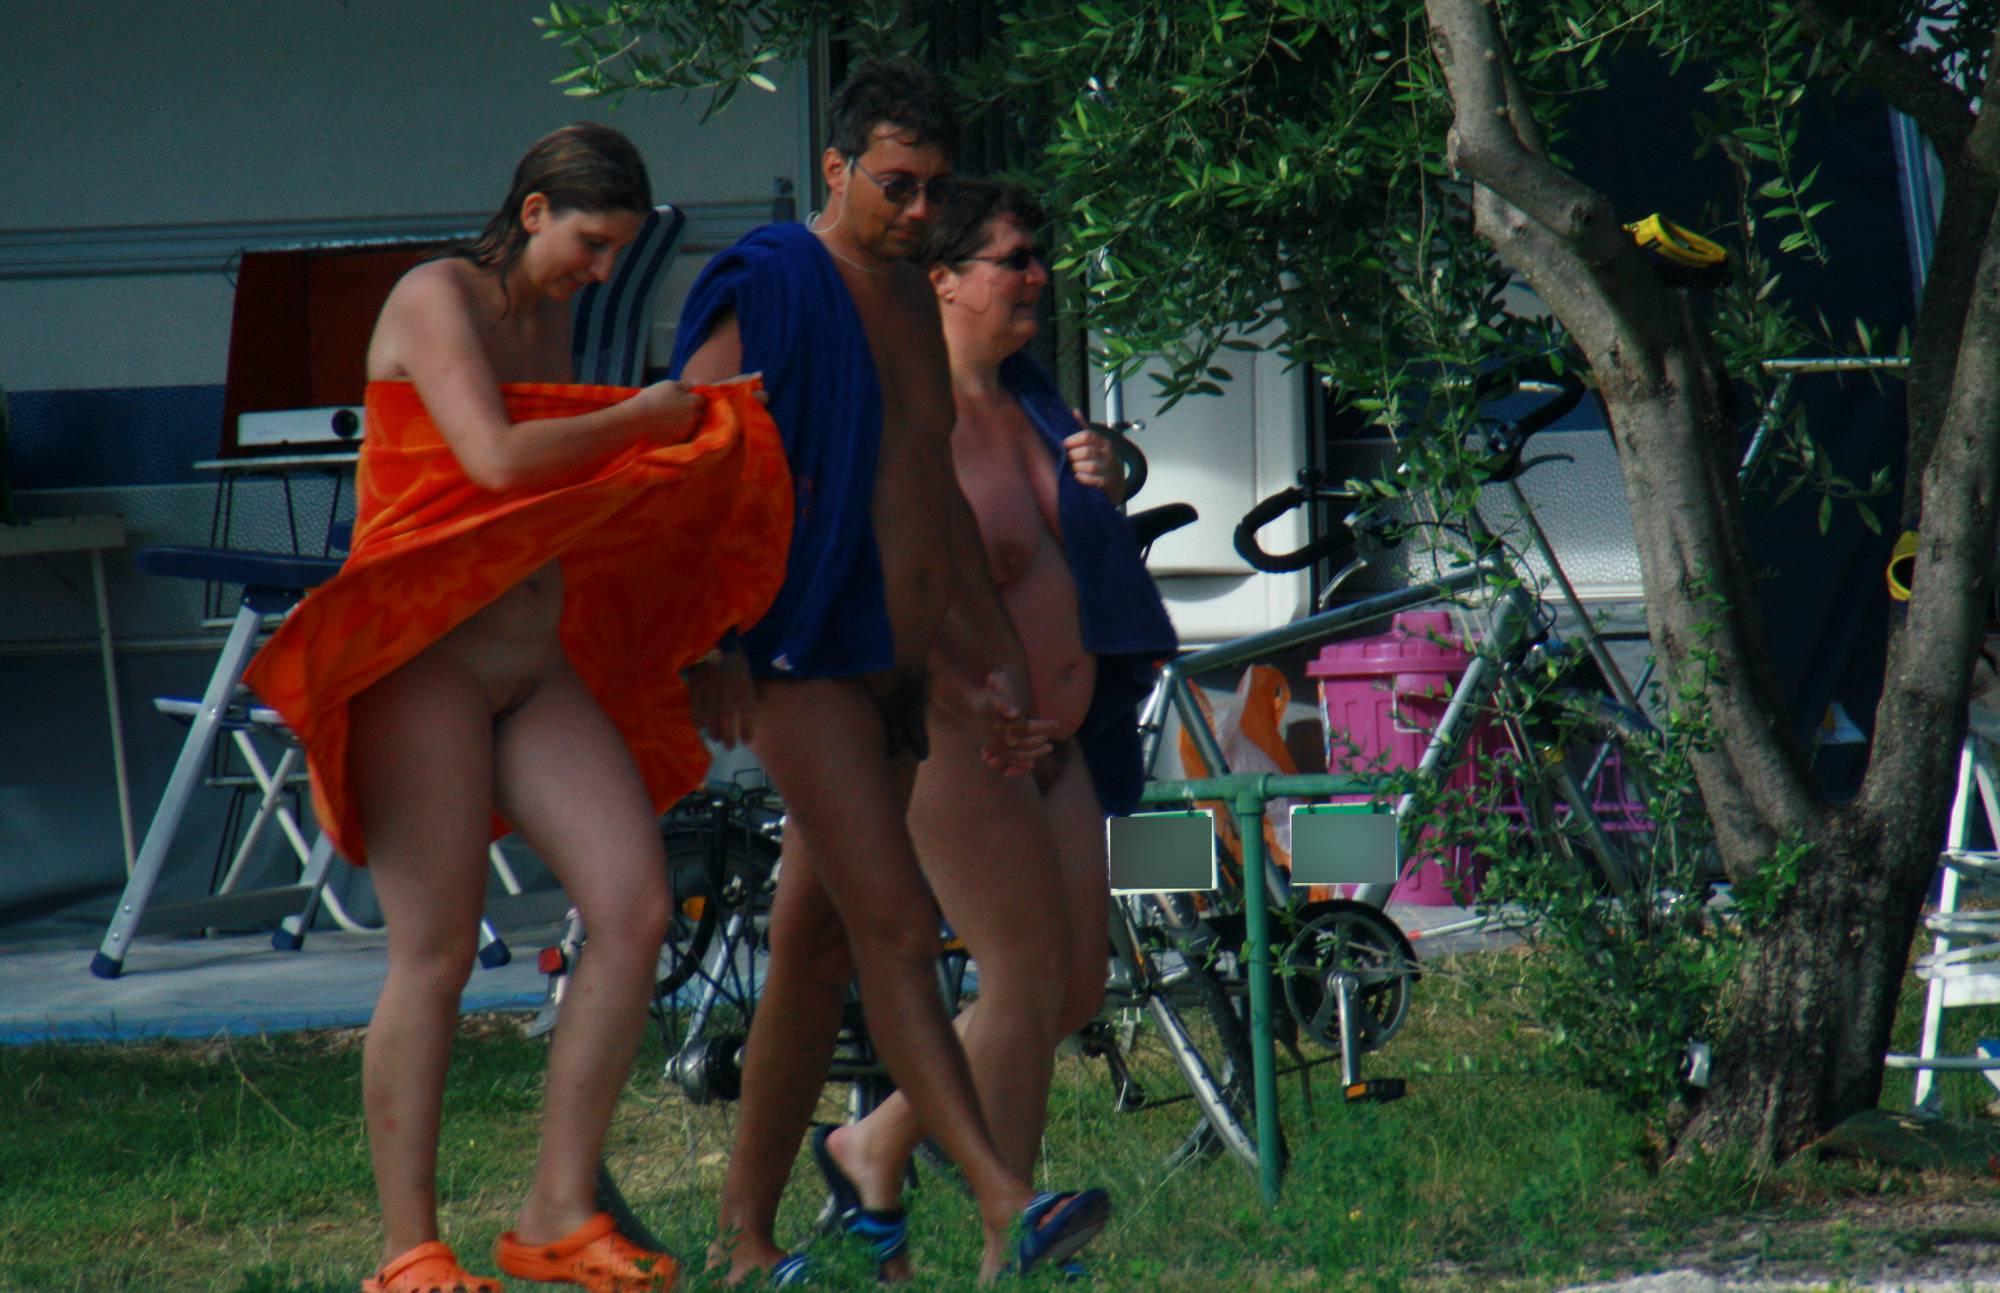 Nude Duet Walking and Bike - 2